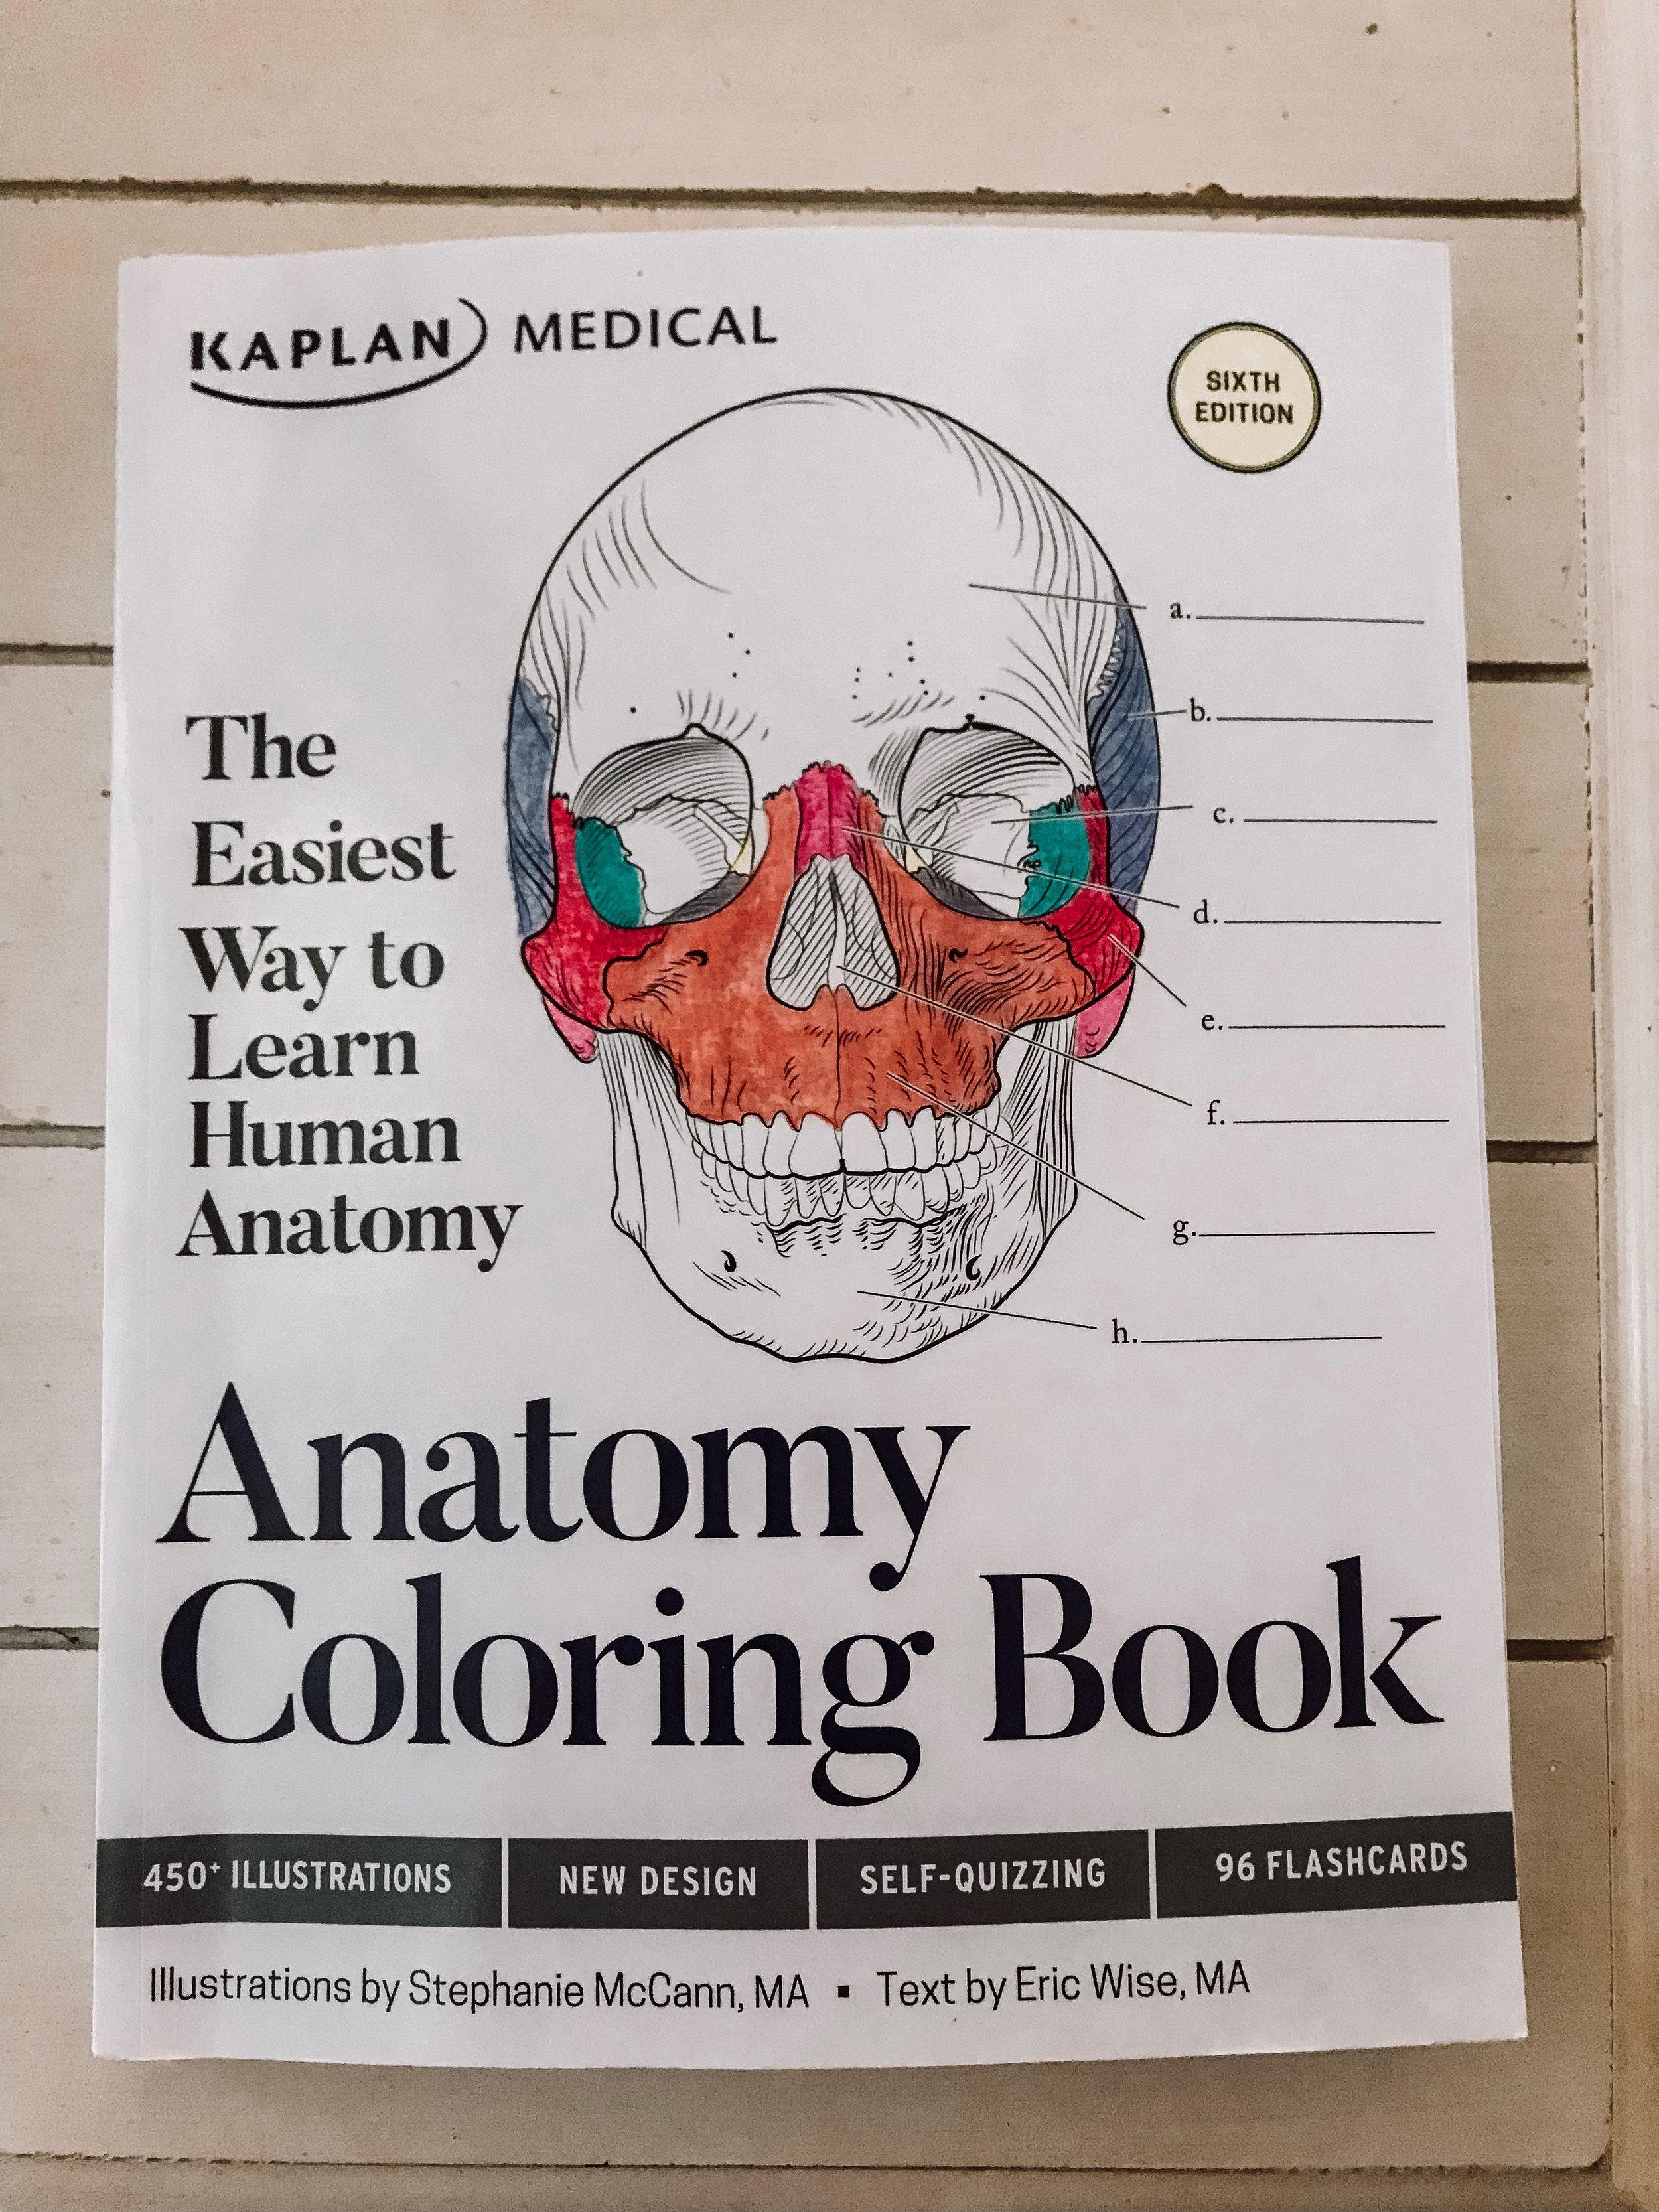 Anatomy Coloring Book.jpg